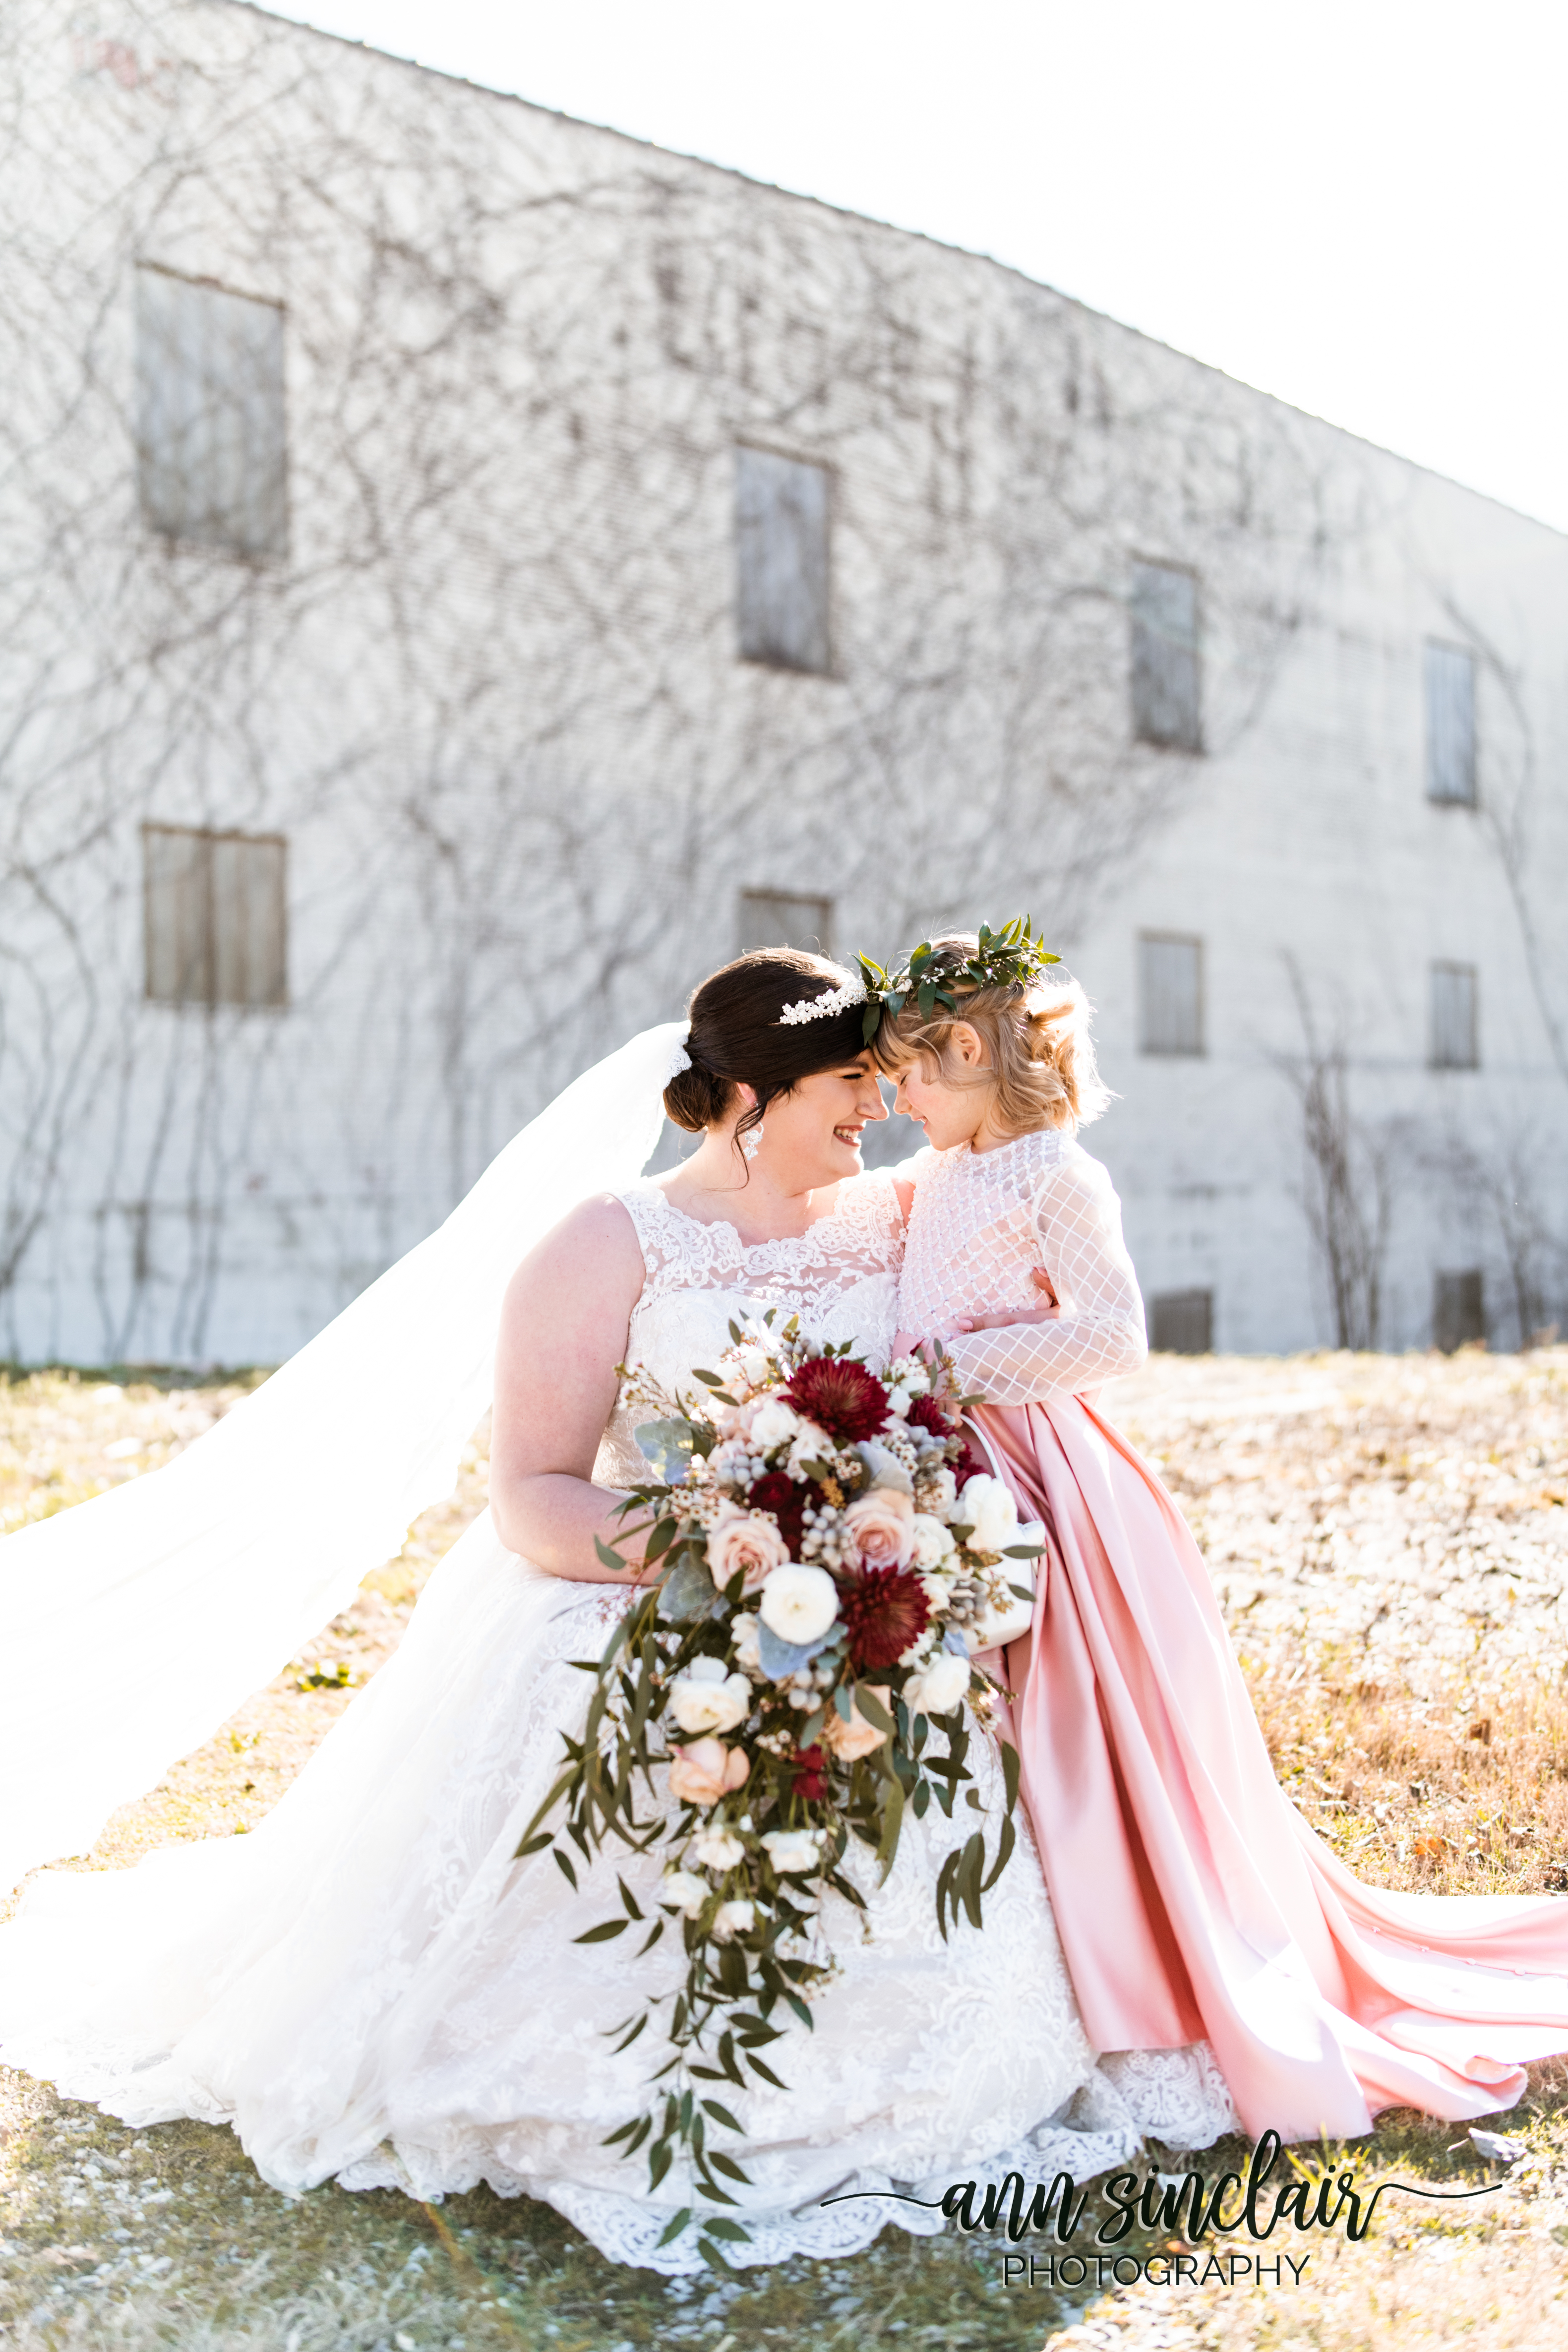 Chaselyn + JT Wedding 00529 g